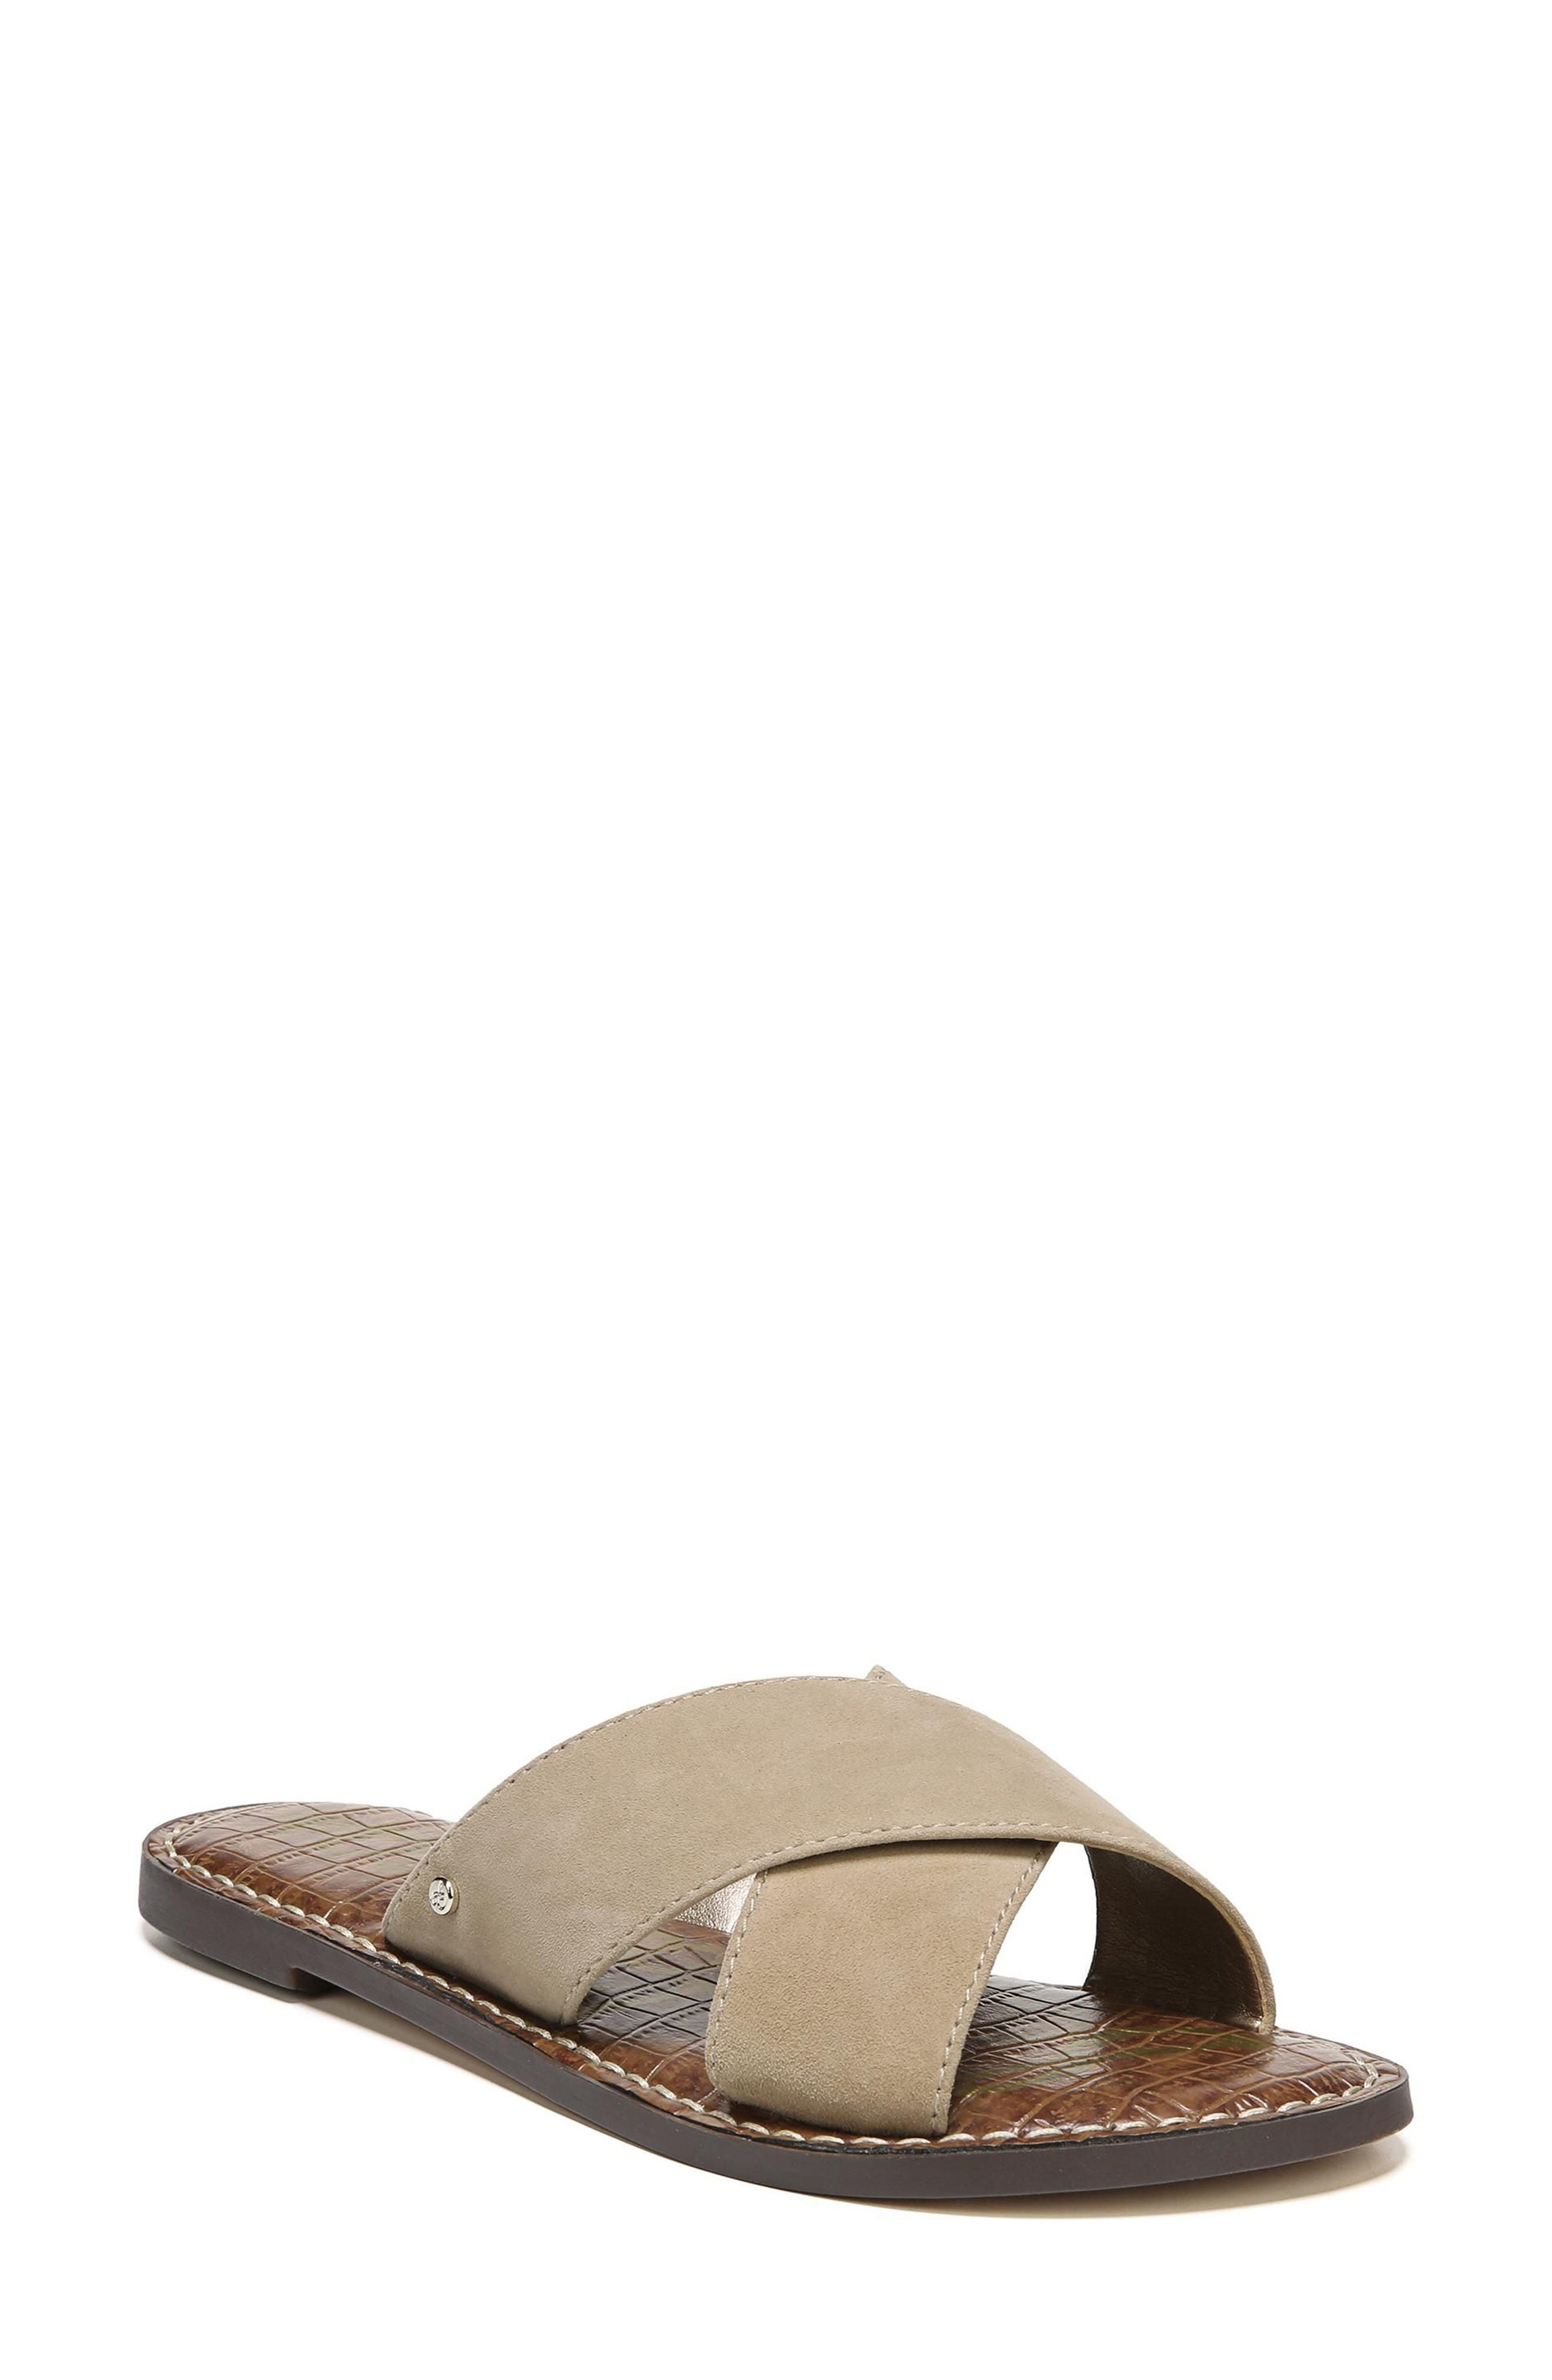 Jane-LEE shoe Comfortable Slipper Flip Sandals Flats Flops Starmoon Designs For Men & Women